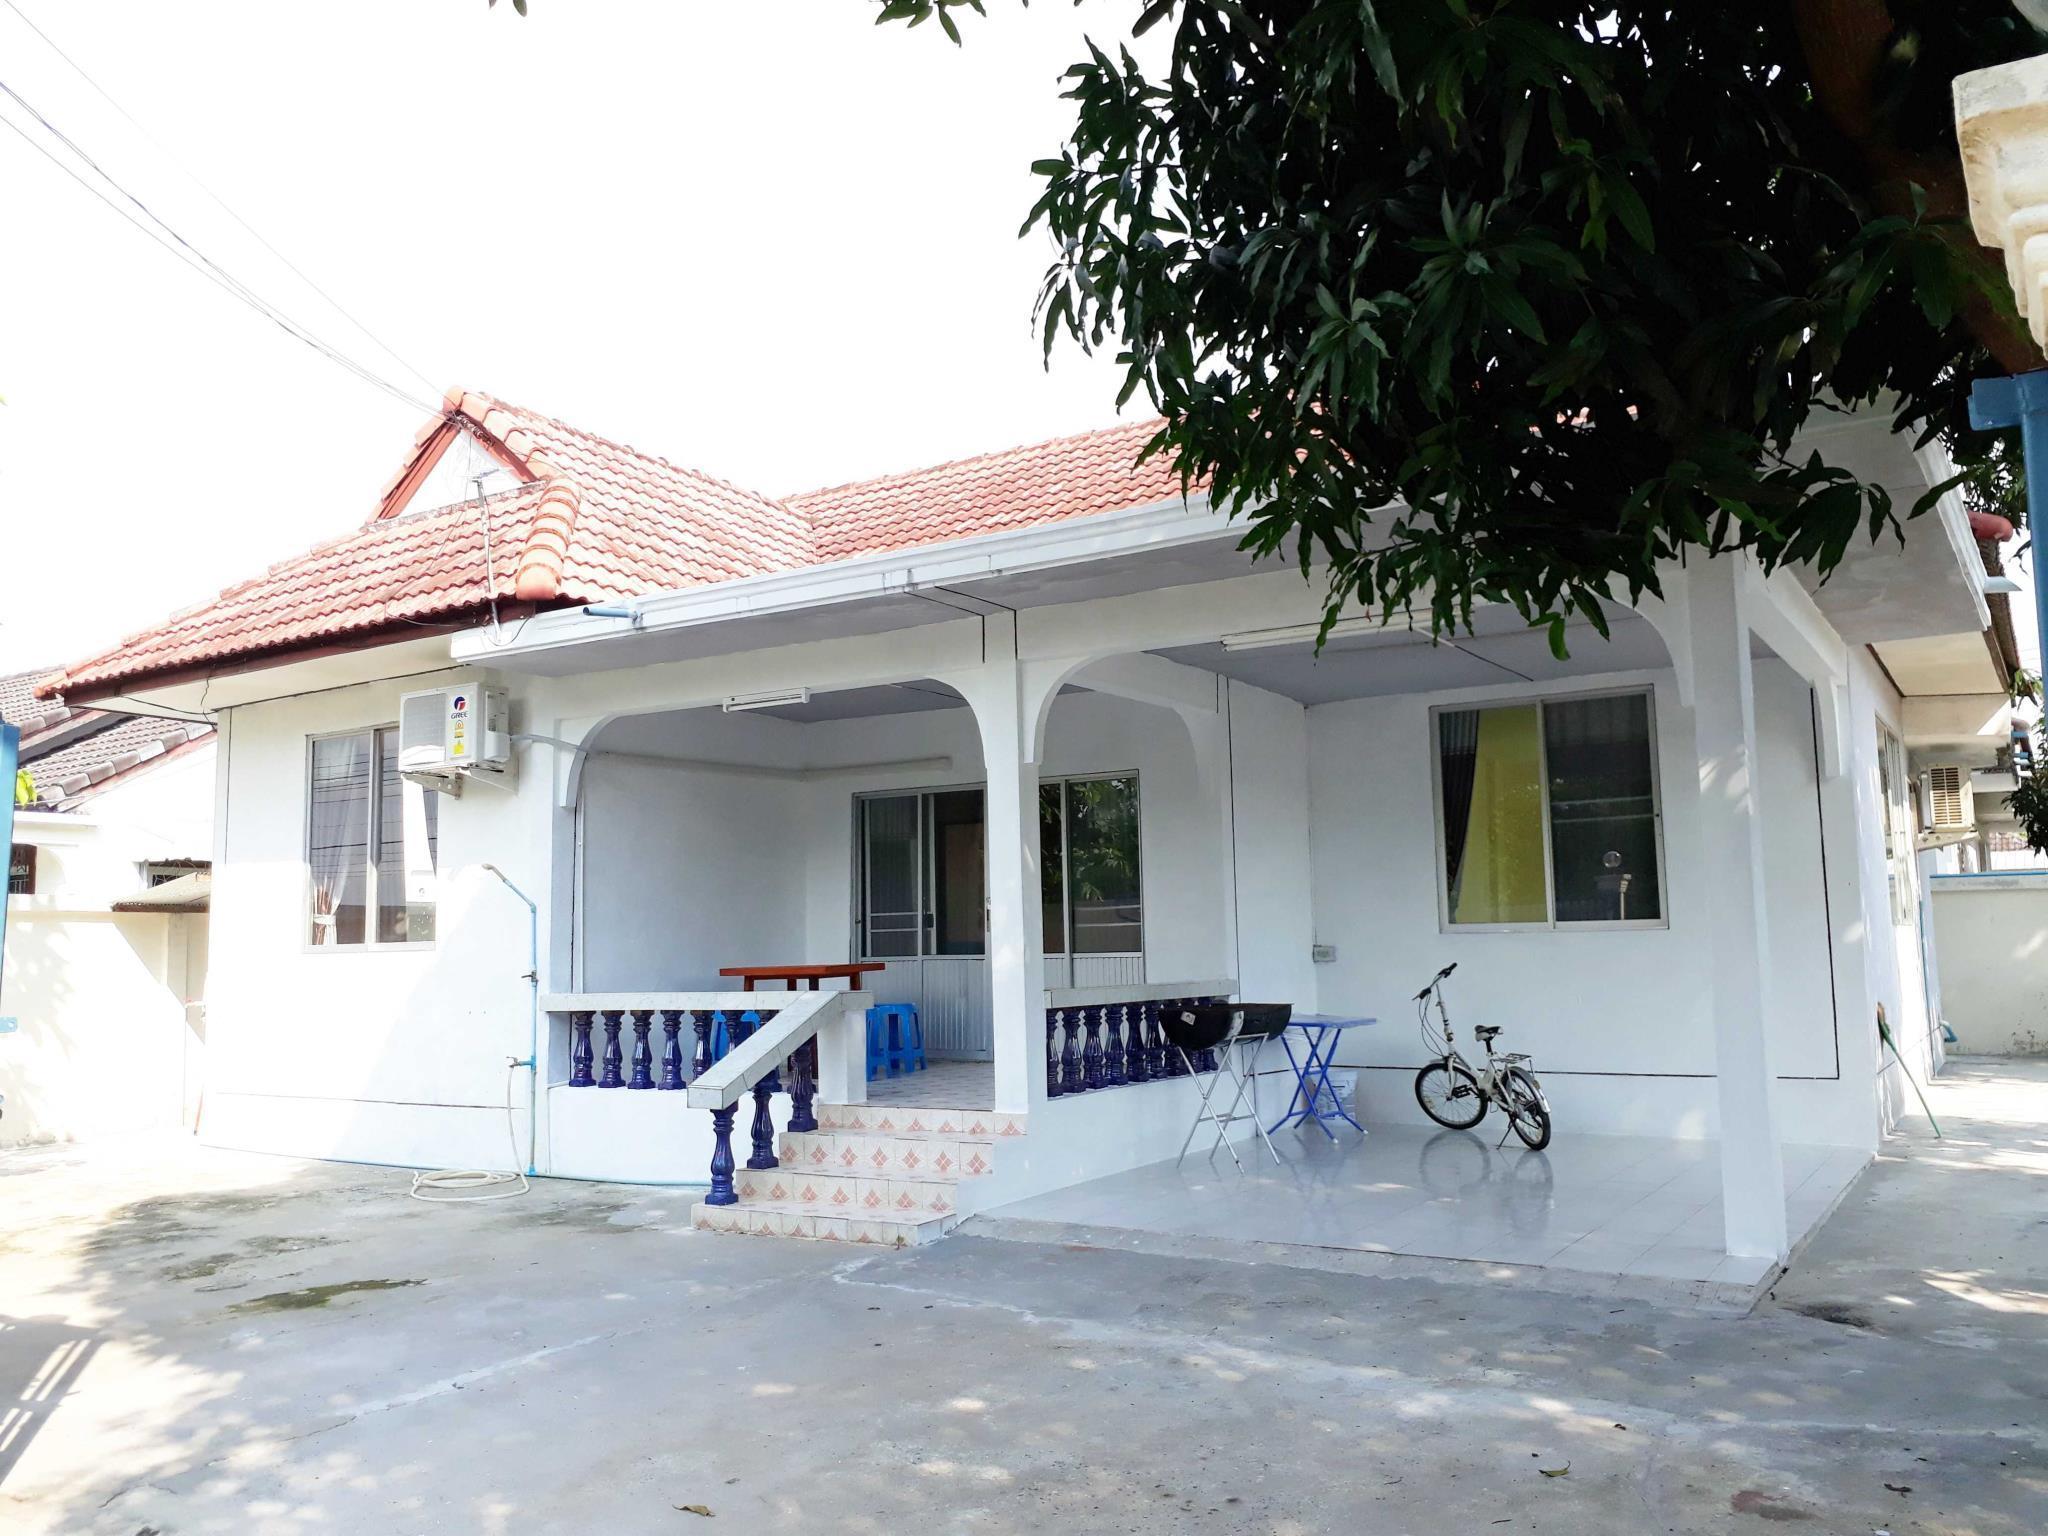 Mae Rampung Beach House N2 Mae Rampung Beach House N2